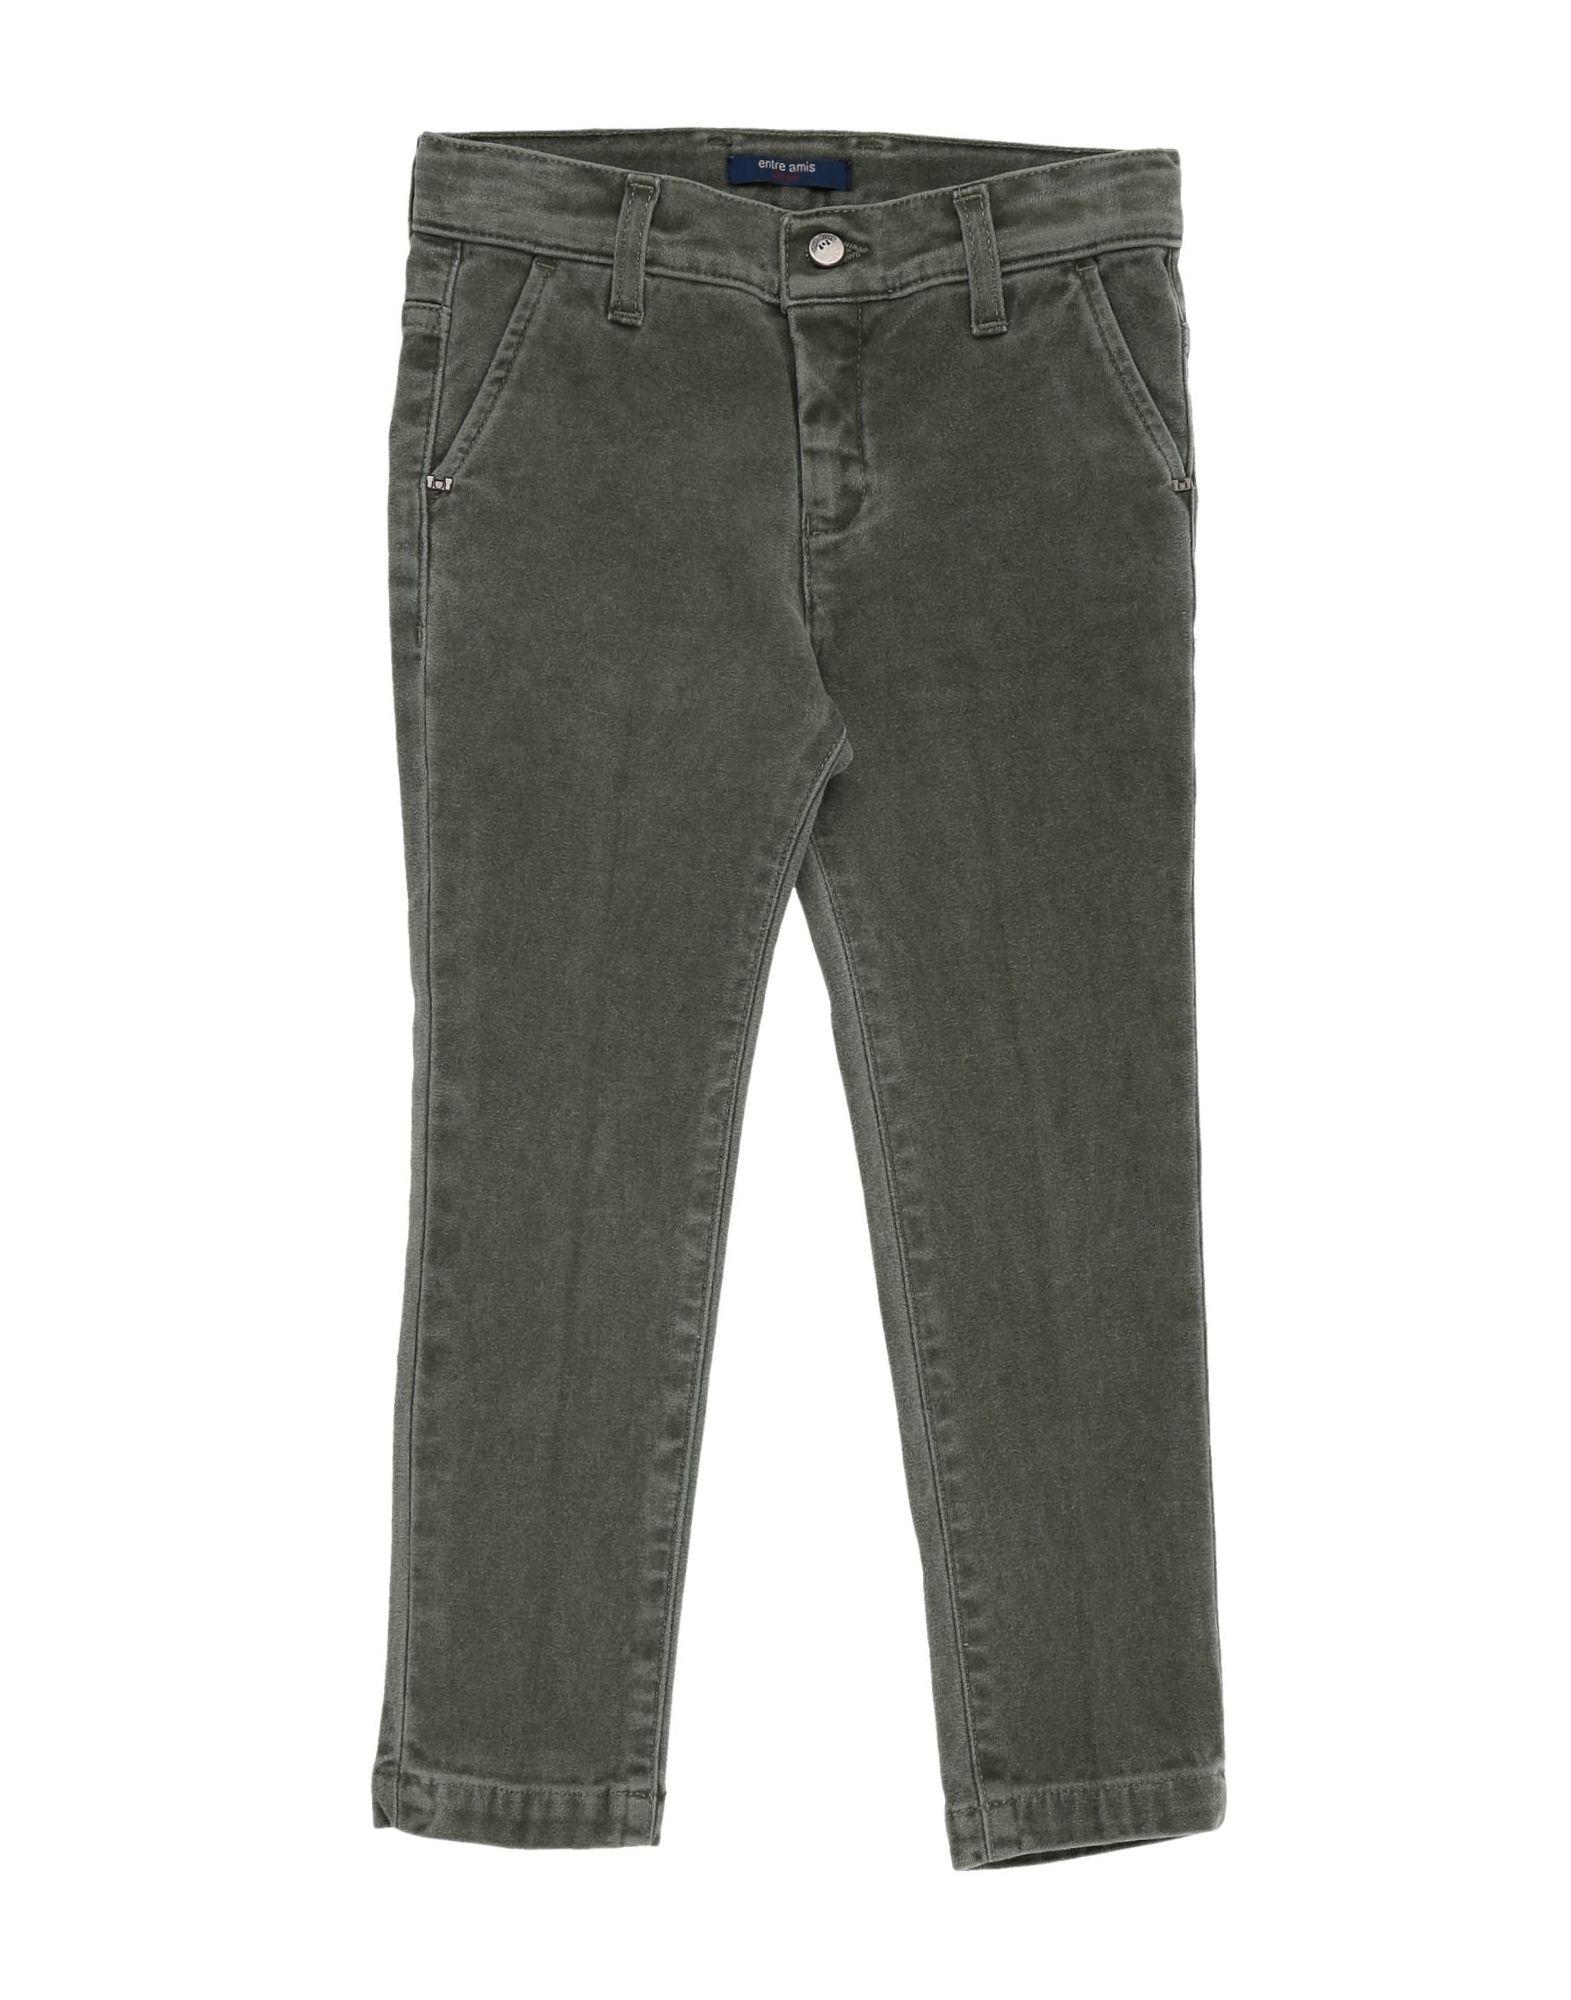 Entre Amis Garçon Kids' Casual Pants In Gray